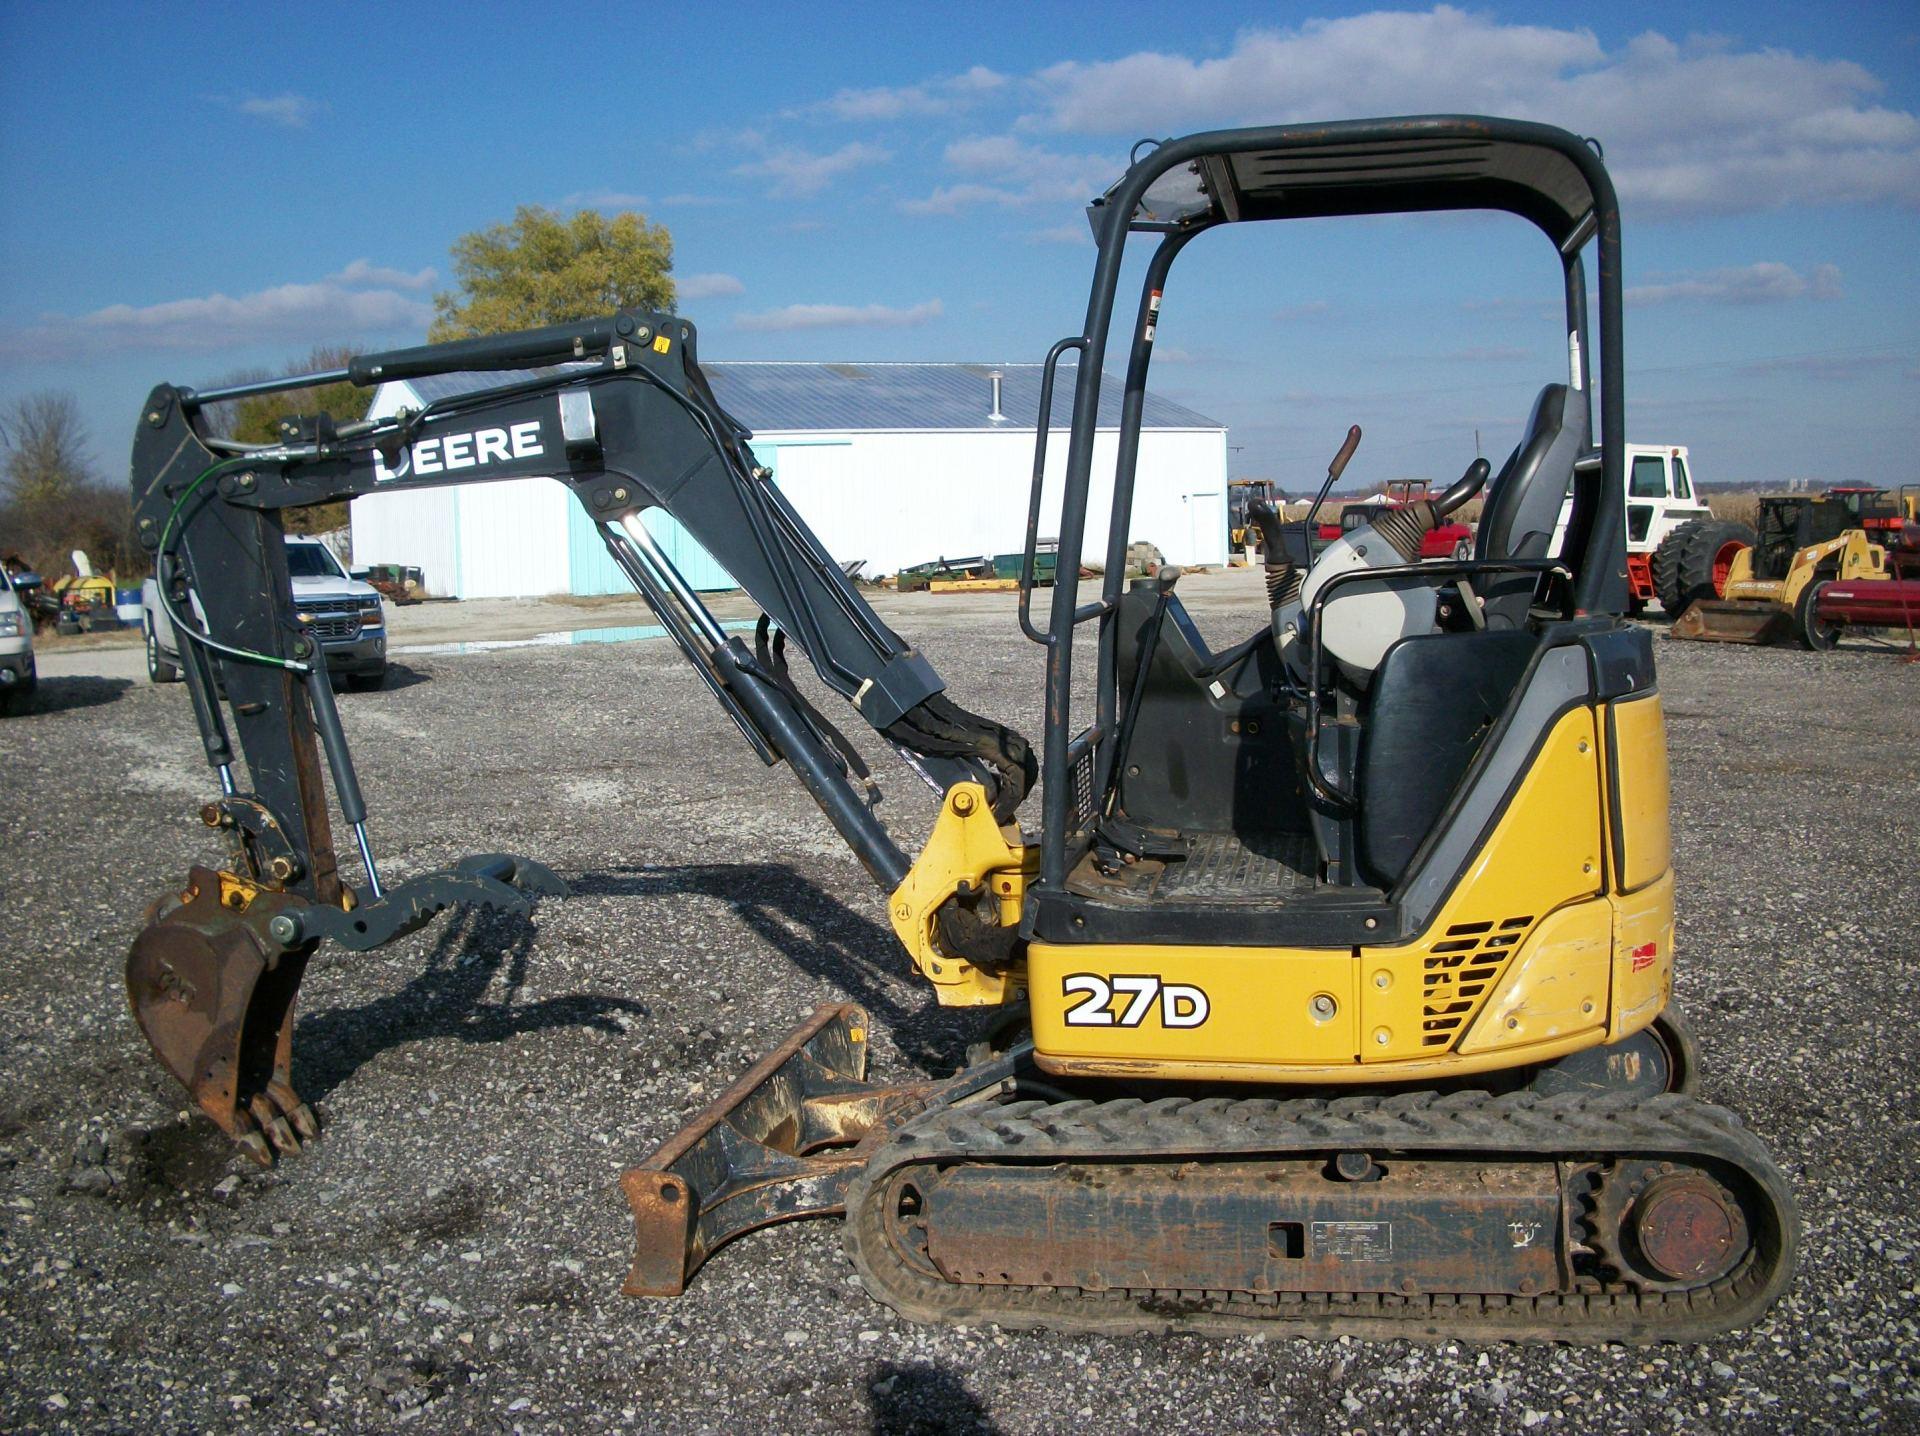 2013 John Deere 27D     $21,900